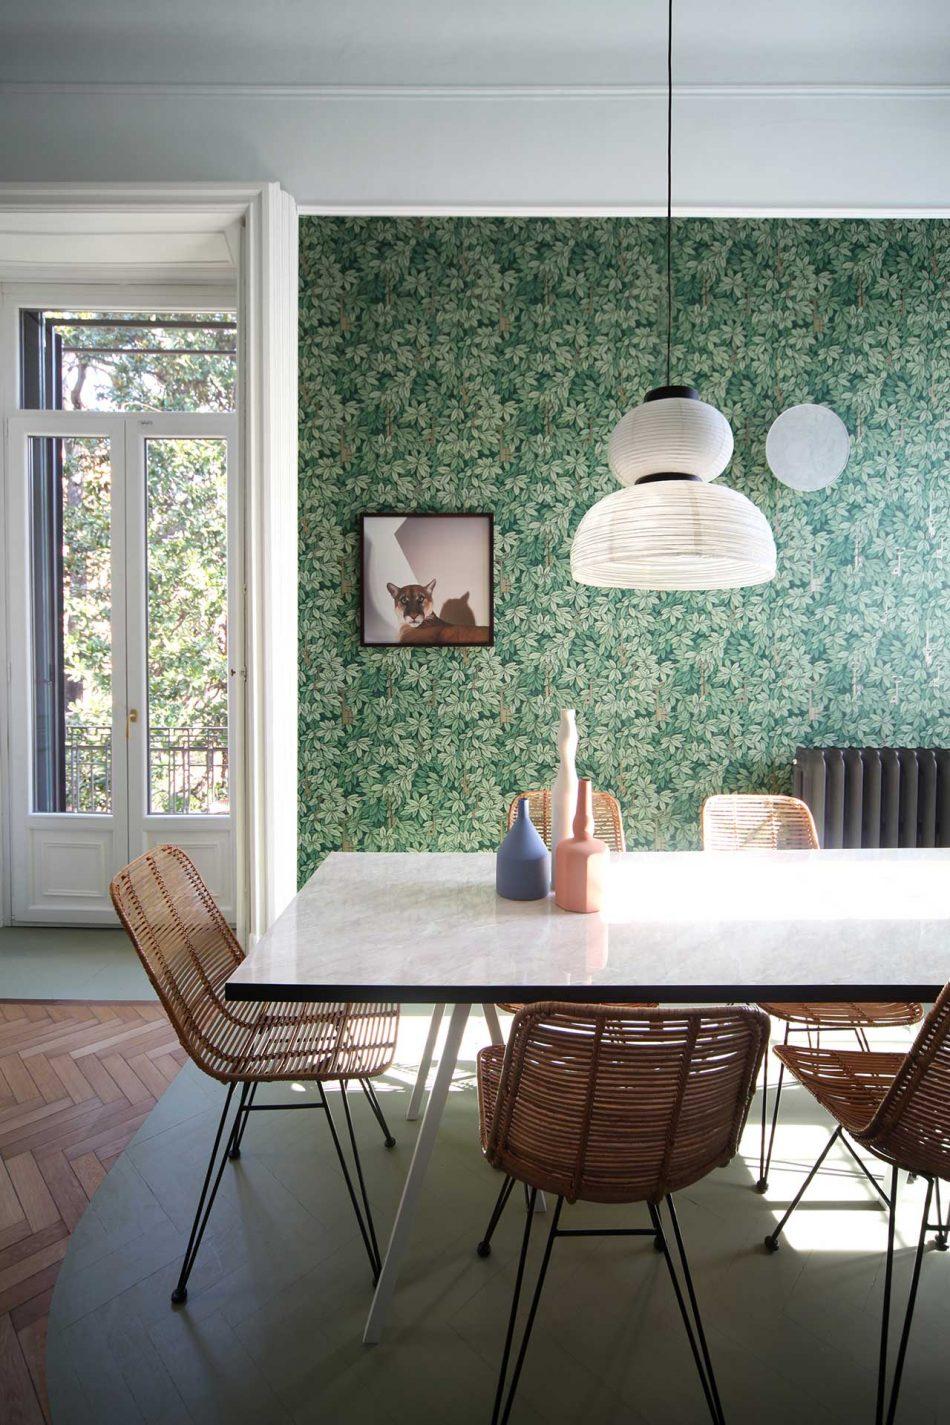 inspirational ebooks Inspirational Ebooks Featuring Designers of Paris and Milan f3 le temps retrouve apartment milan marcante testa yatzer 1